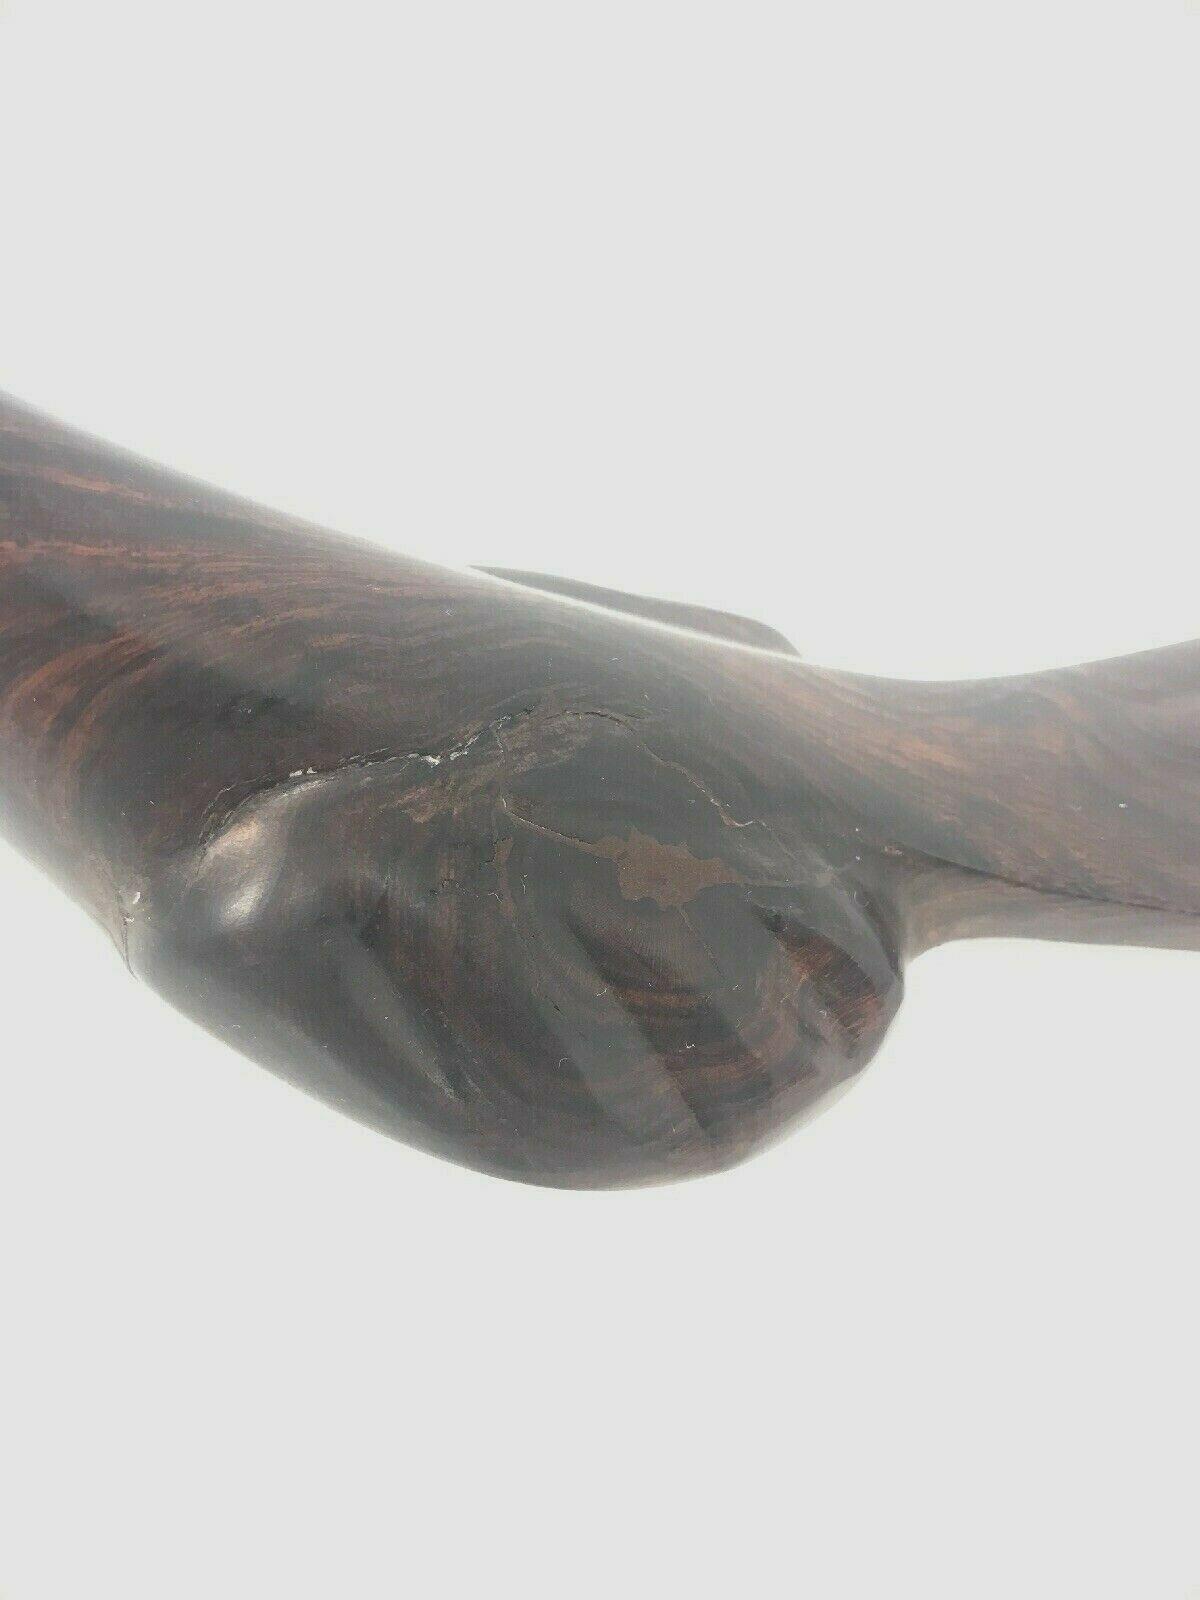 "Vintage Ironwood Roadrunner Bird Statue Hand Carved Figure Wooden Sculpture 9.5"""